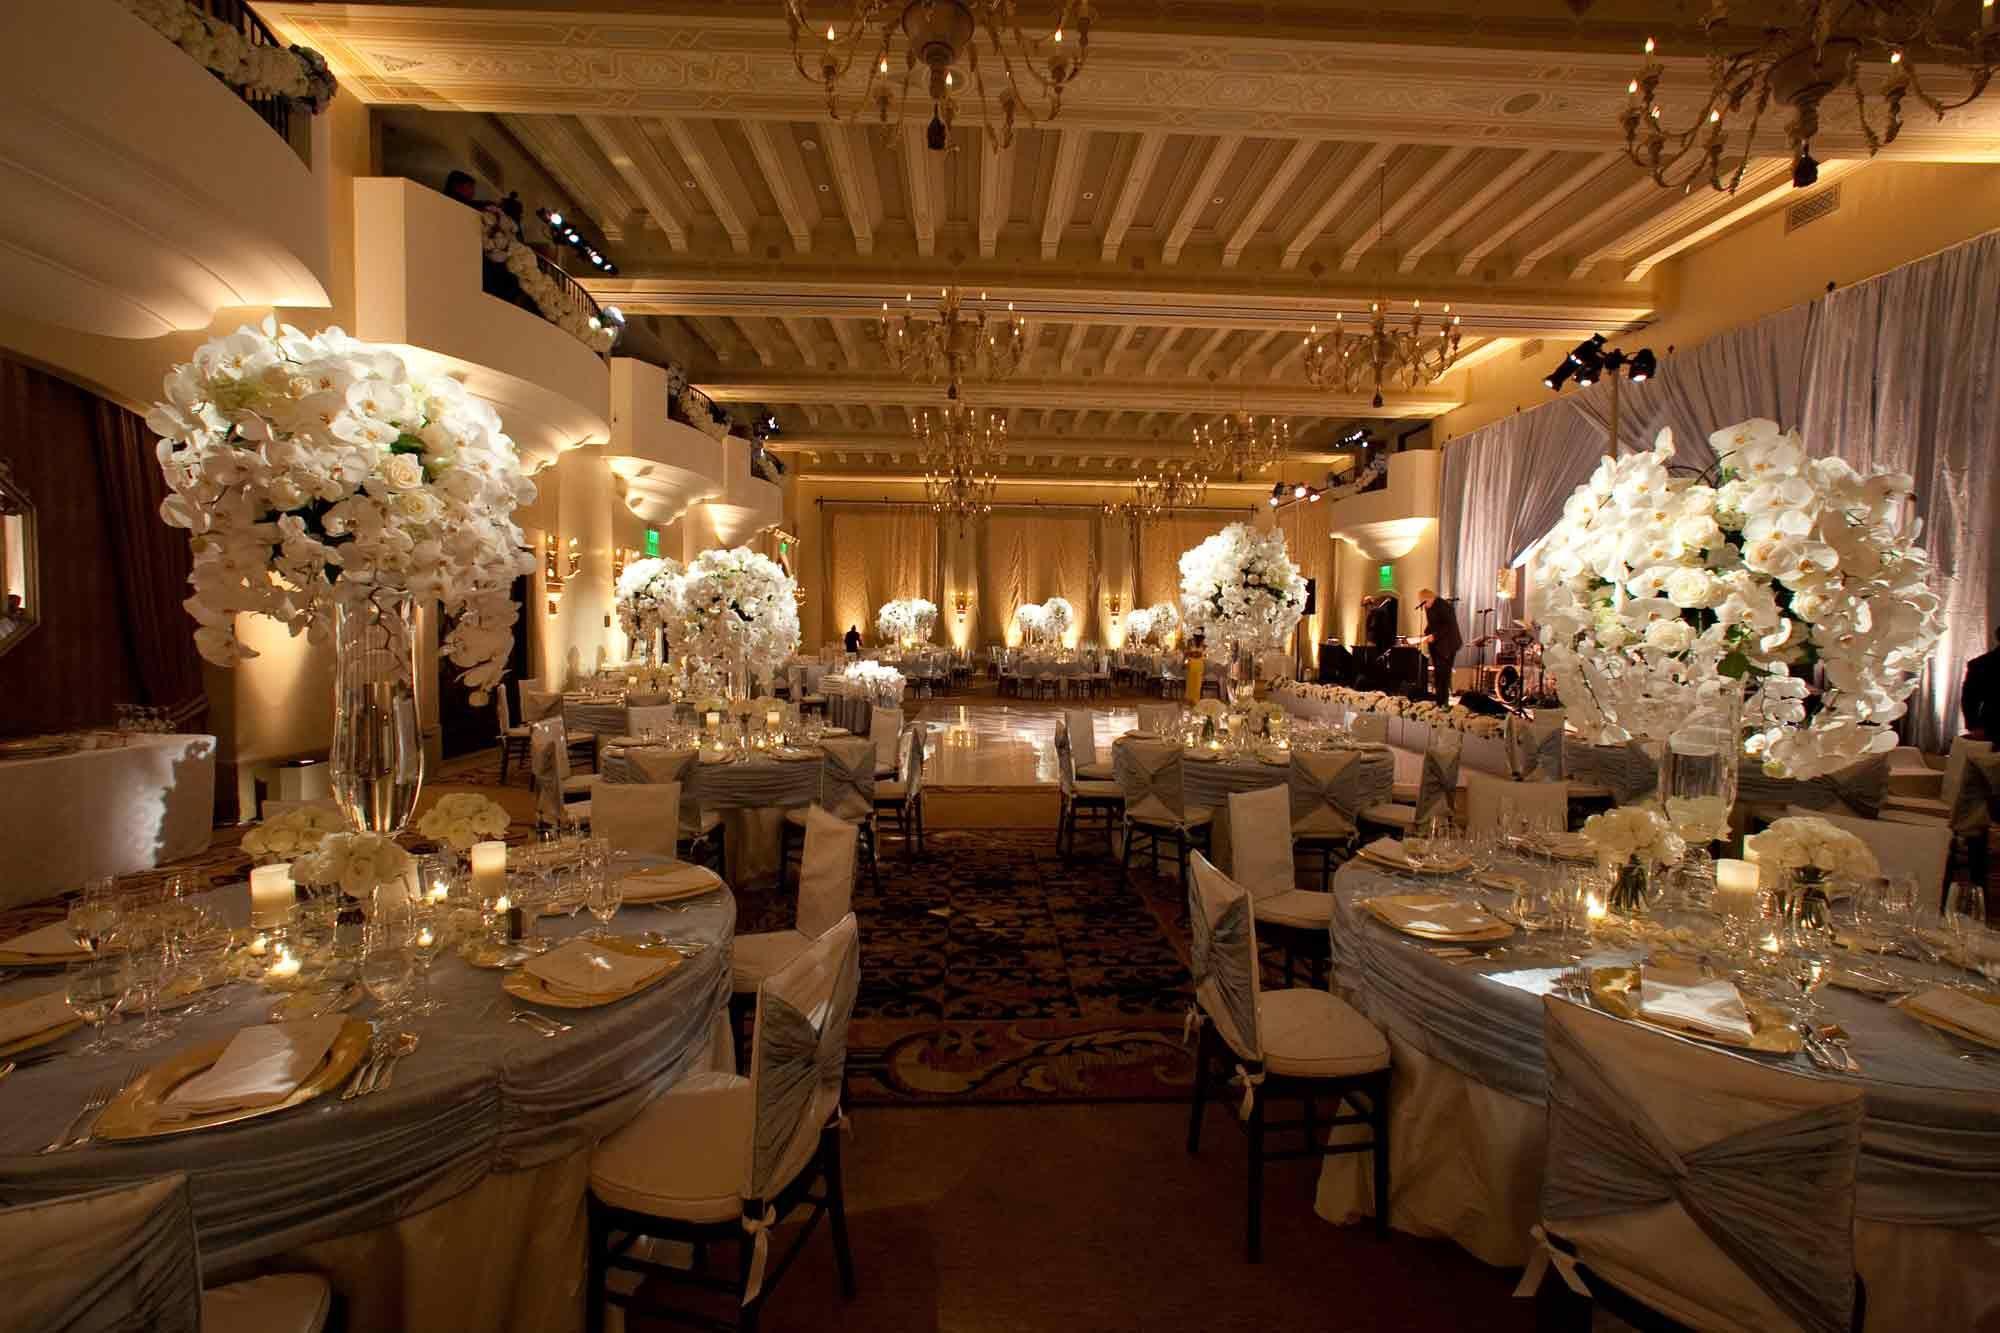 Montage Beverly Hills | Montage Weddings | Pinterest | Beverly hills ...